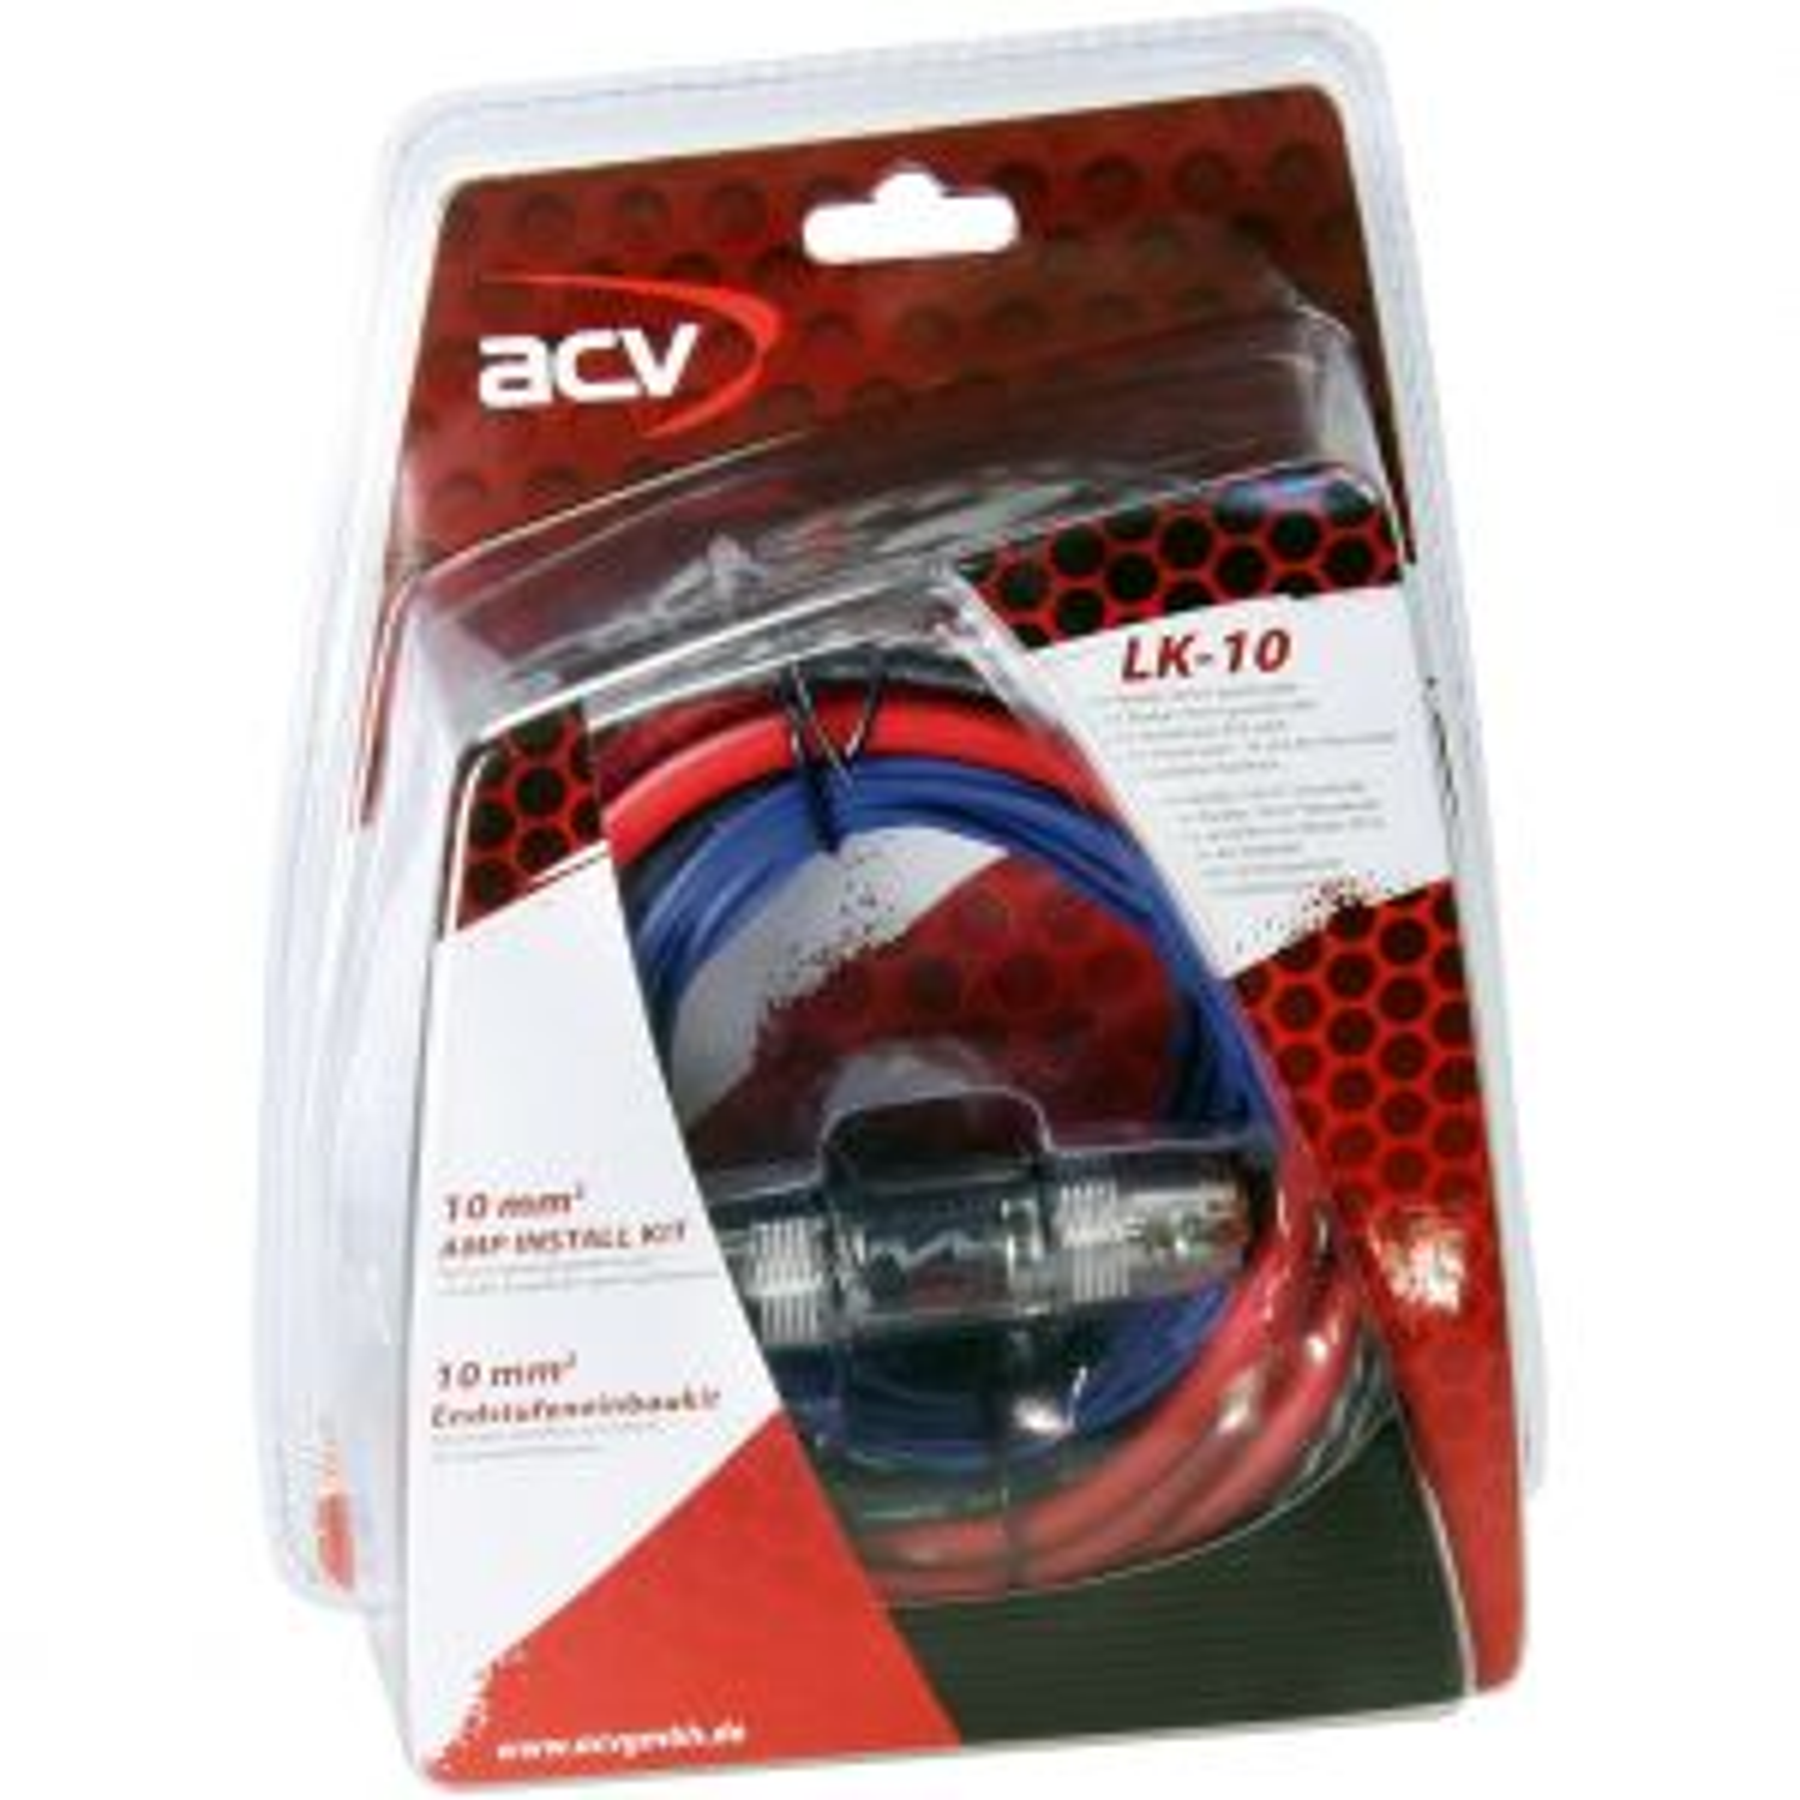 ACV LK-10